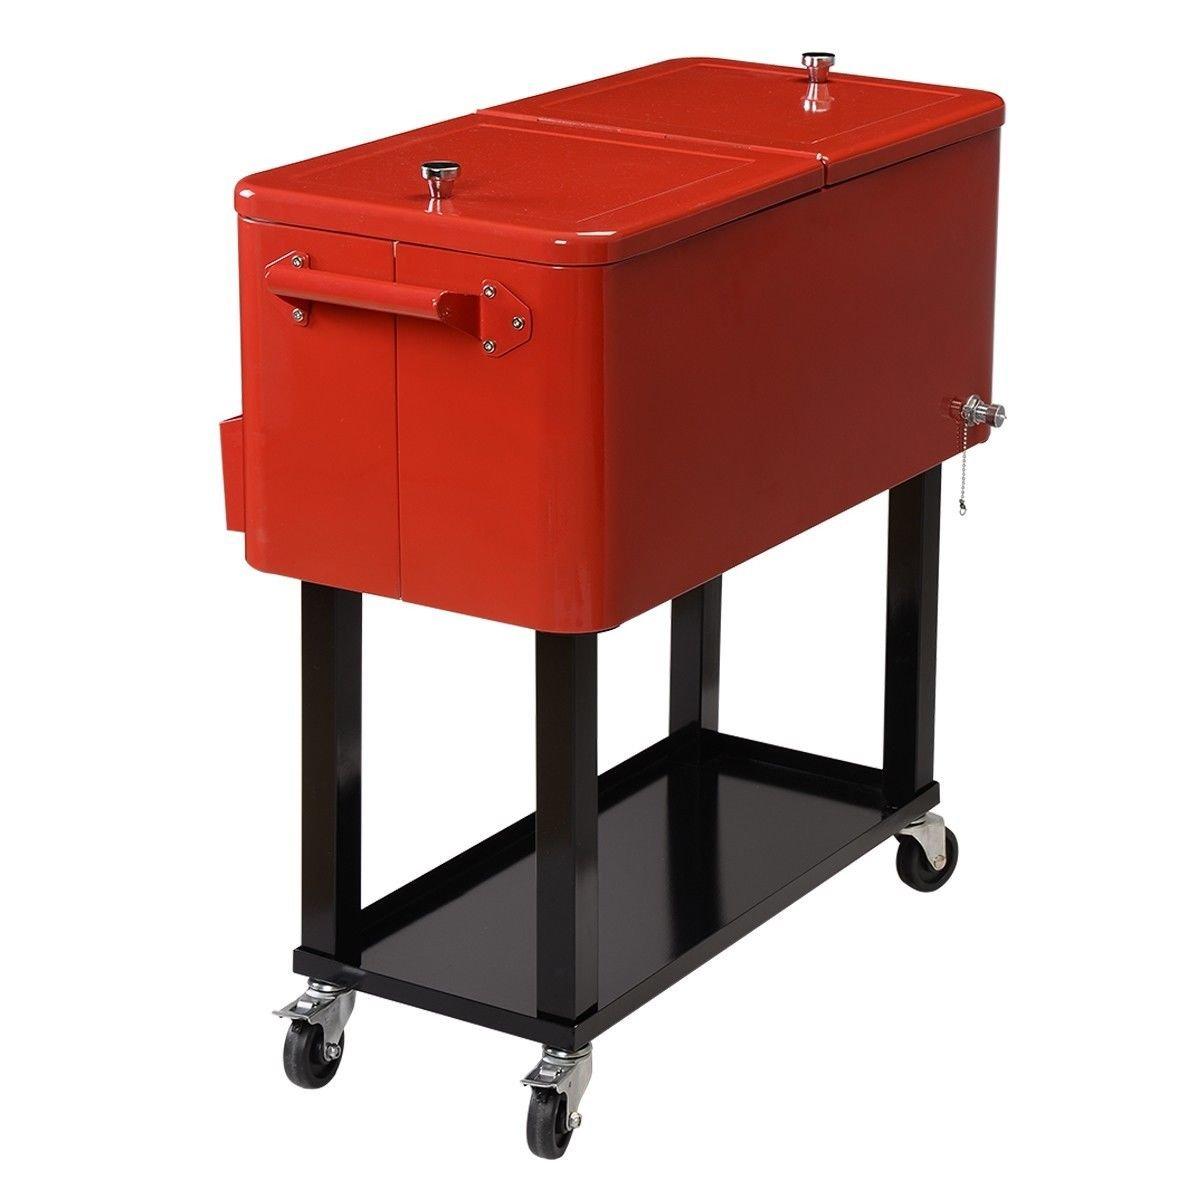 Portable bar cooler rolling patio deck cart beer storage for Mobili bar cart